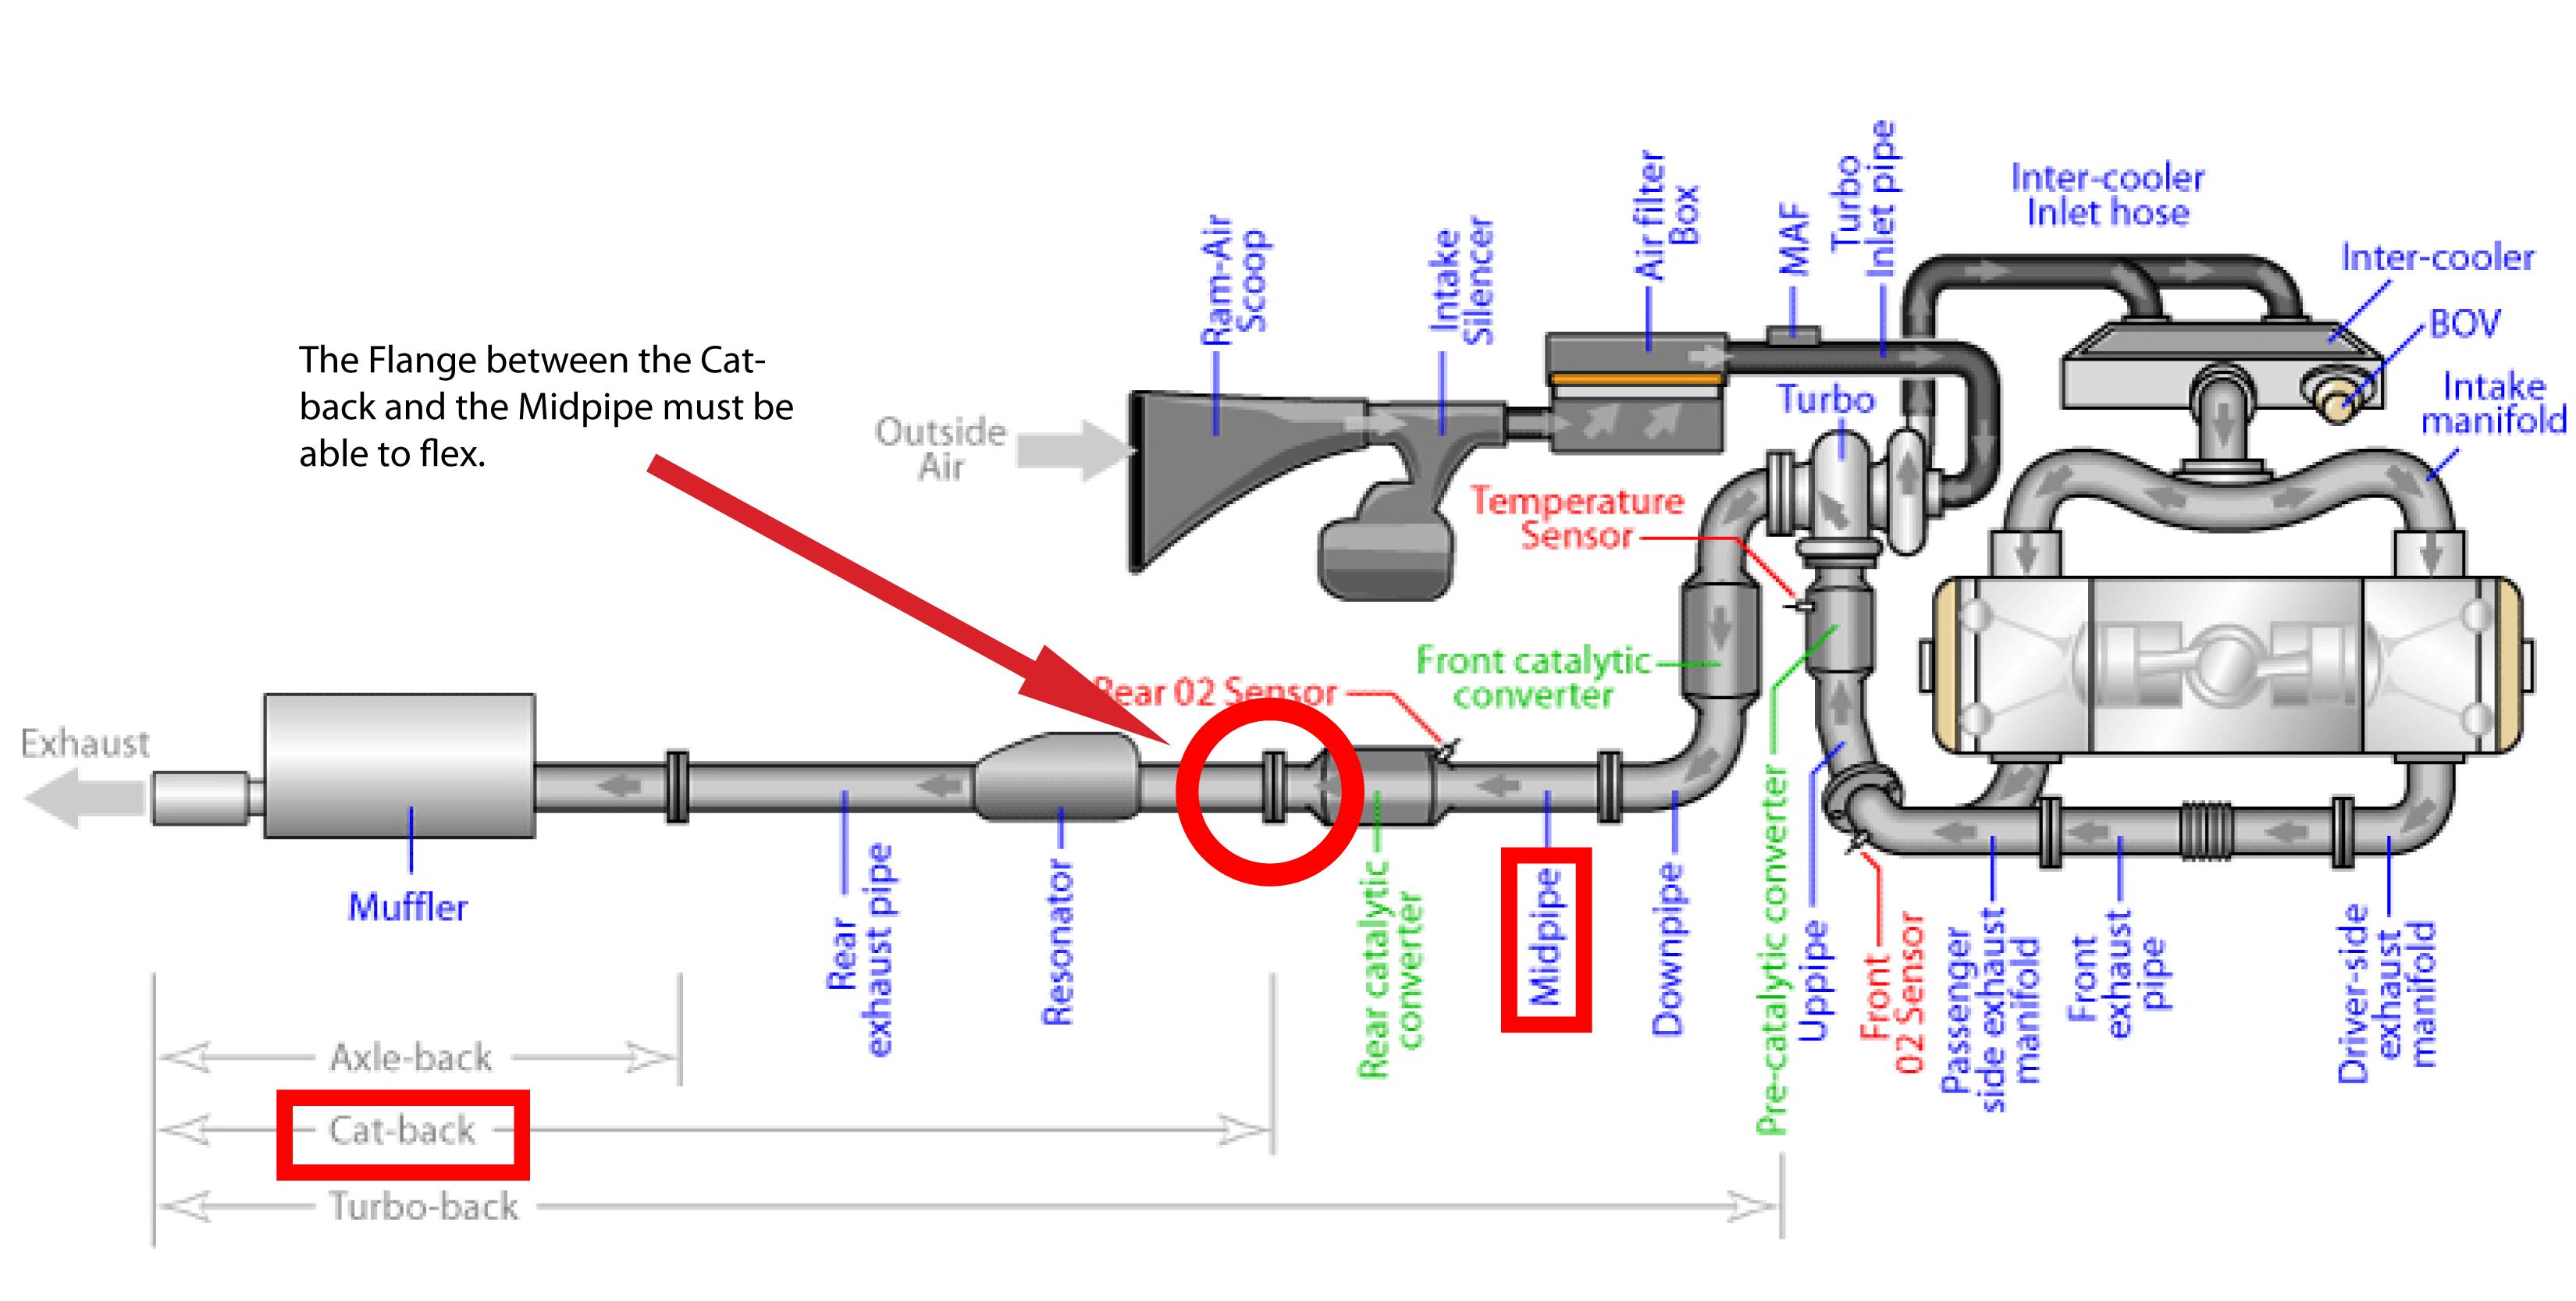 hight resolution of subaru baja wiring harness failure wiring diagrams lol subaru baja wiring harness failure